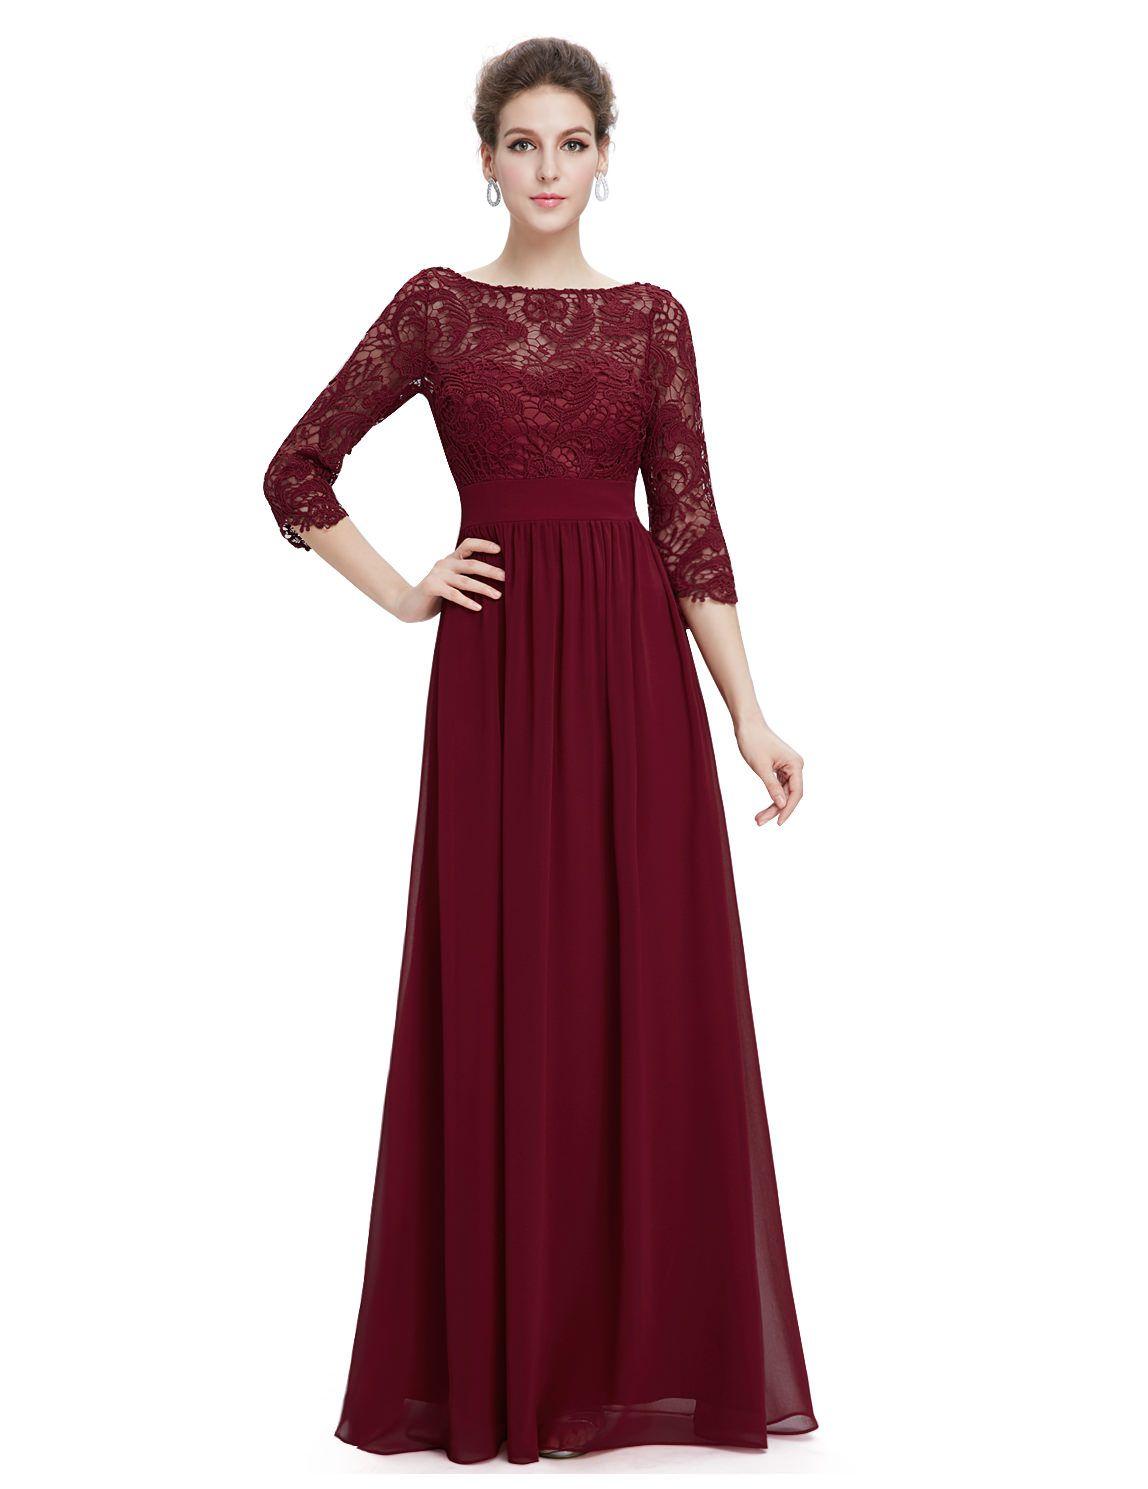 Langes Abendkleid mit eleganter Spitze Bordeaux Rot  Elegante